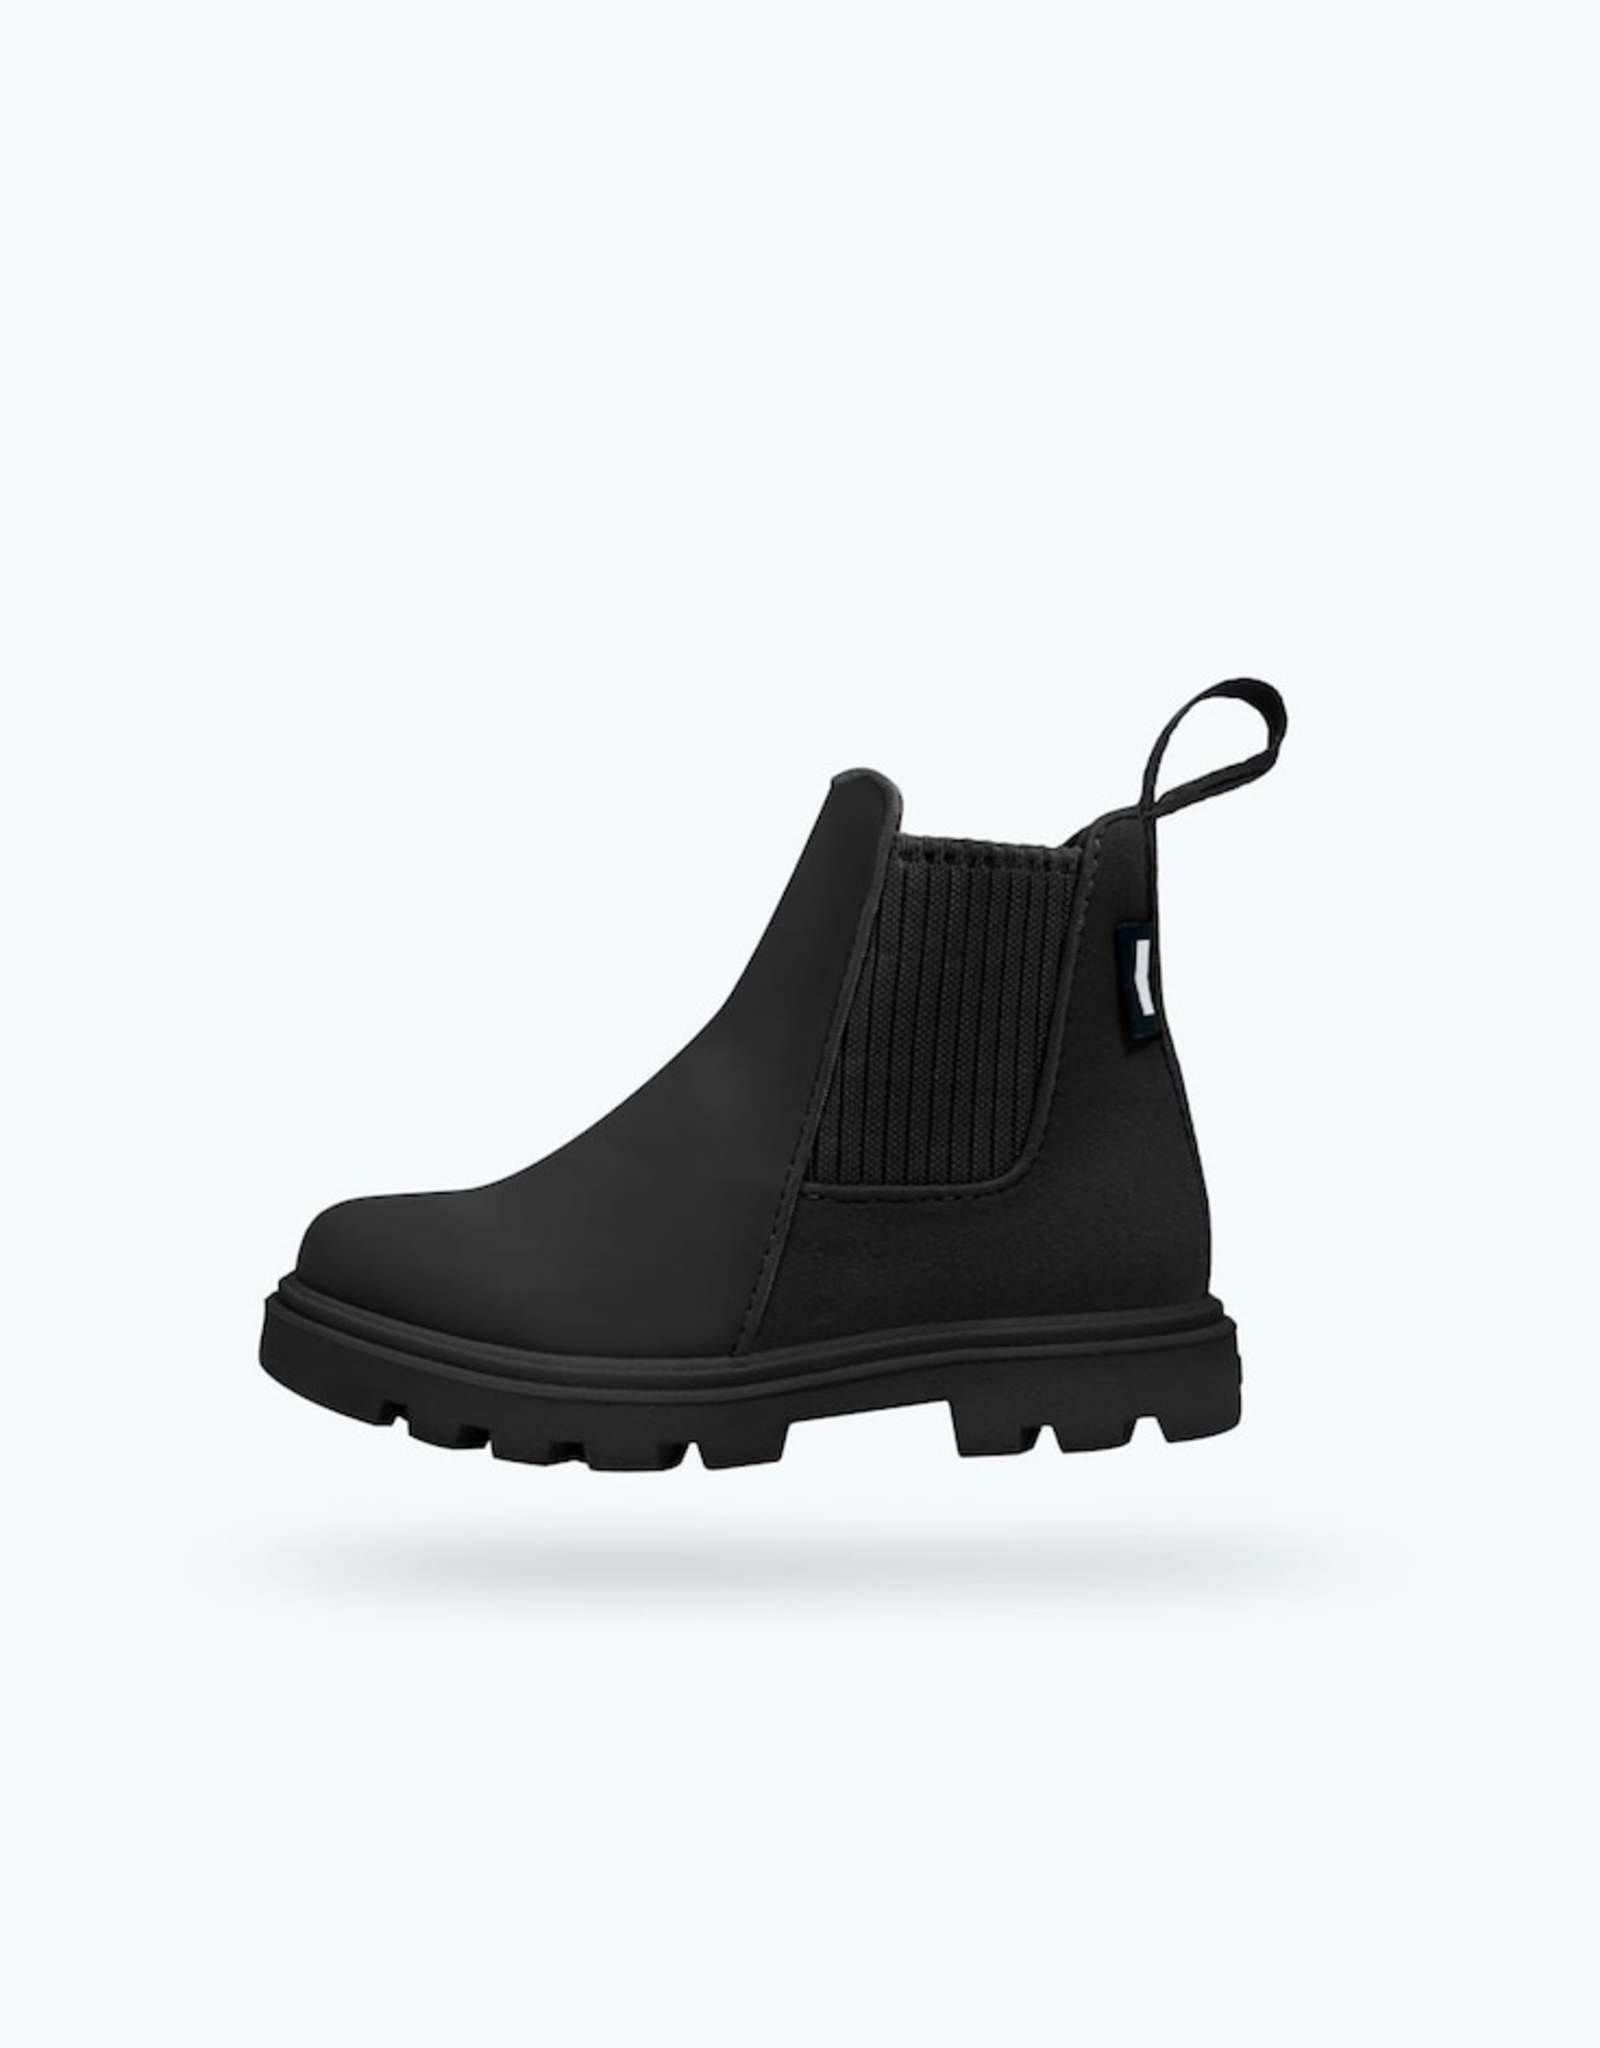 Native Shoes Kensington Treklite Junior Boot For Kids